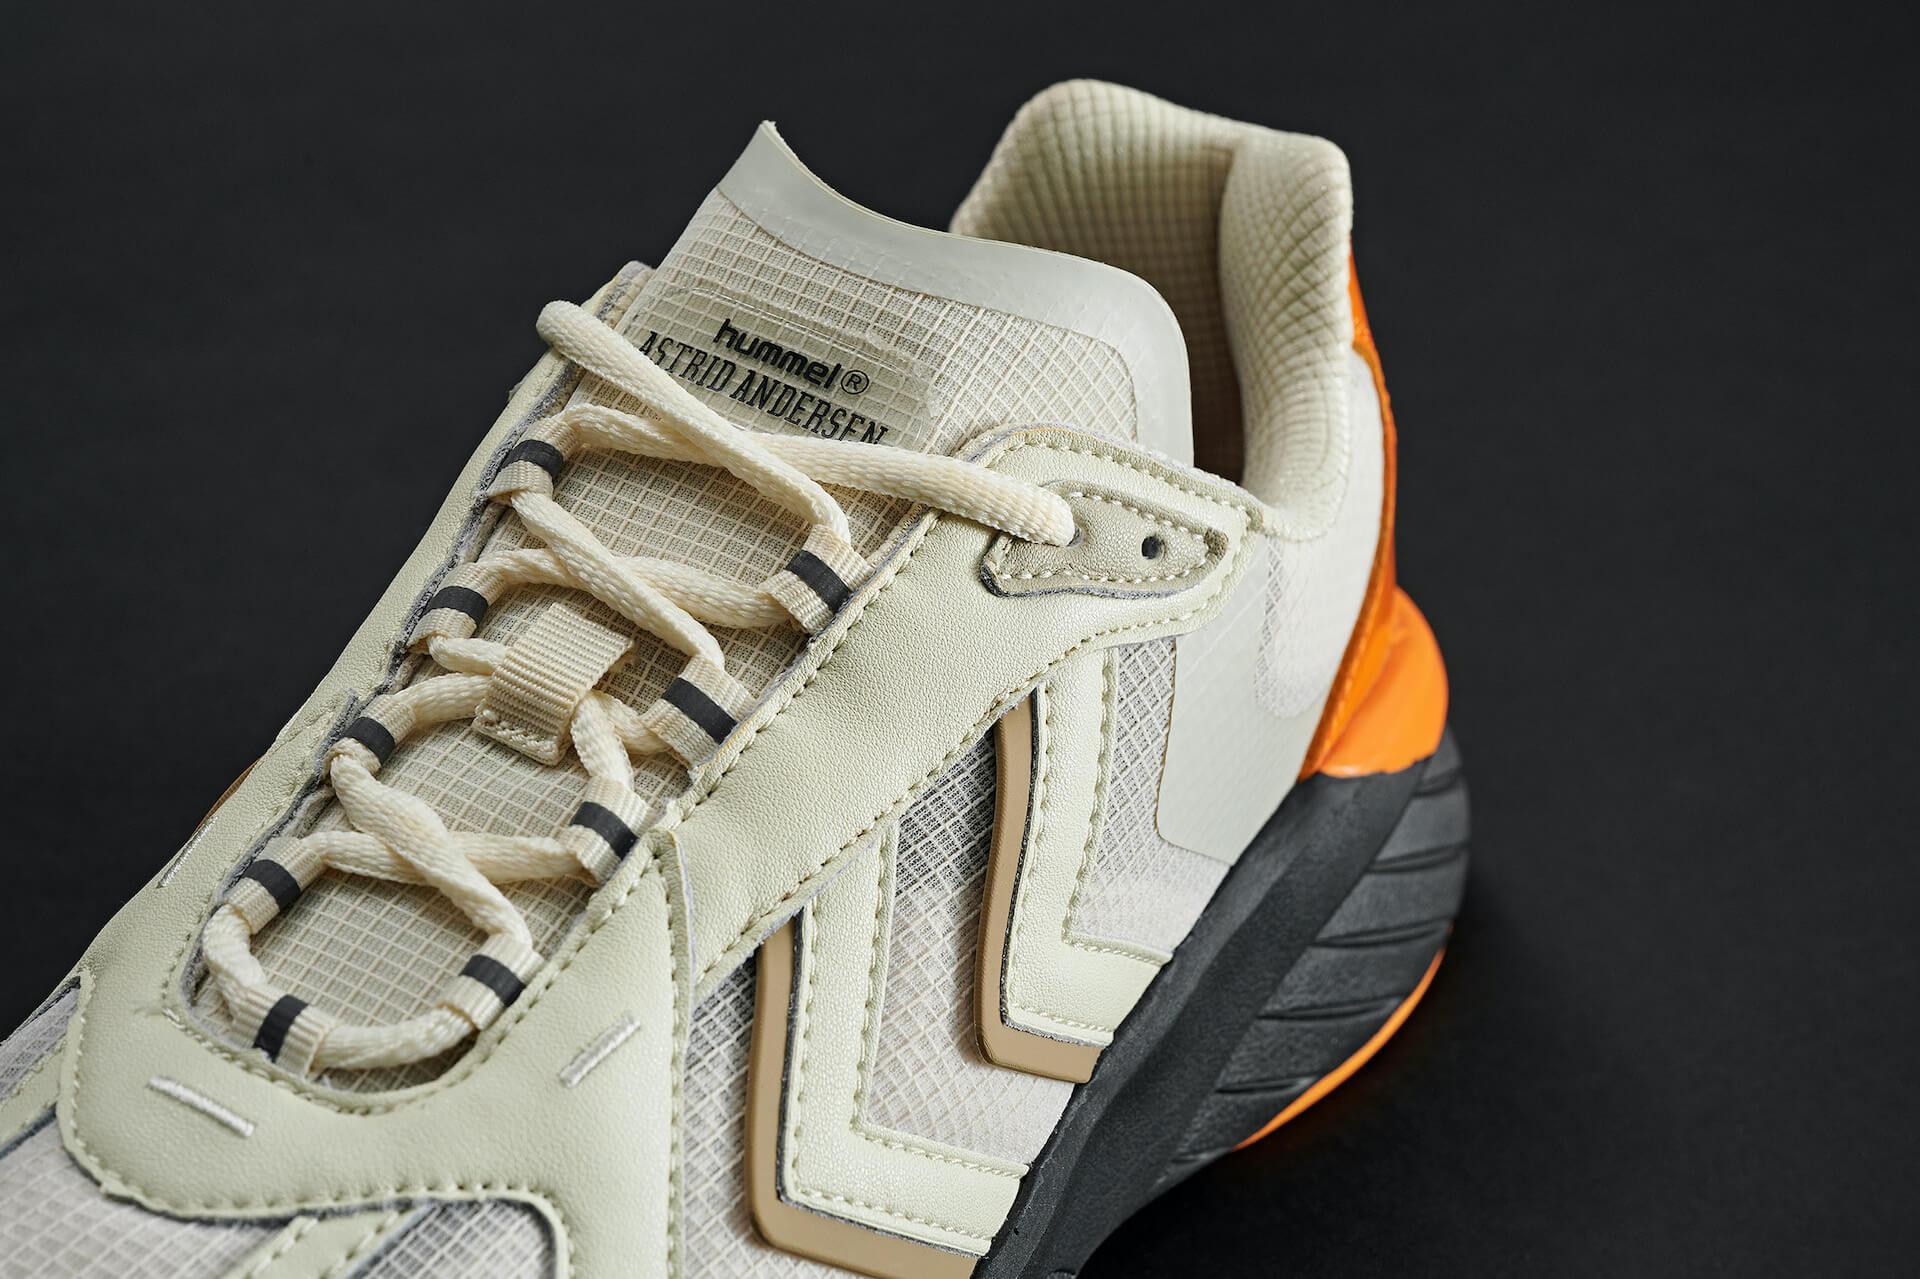 HUMMEL HIVEとASTRID ANDERSENのコラボスニーカーが東京・上野のmita sneakers限定で発売! lf200819_hummelhive_astritandersen_07